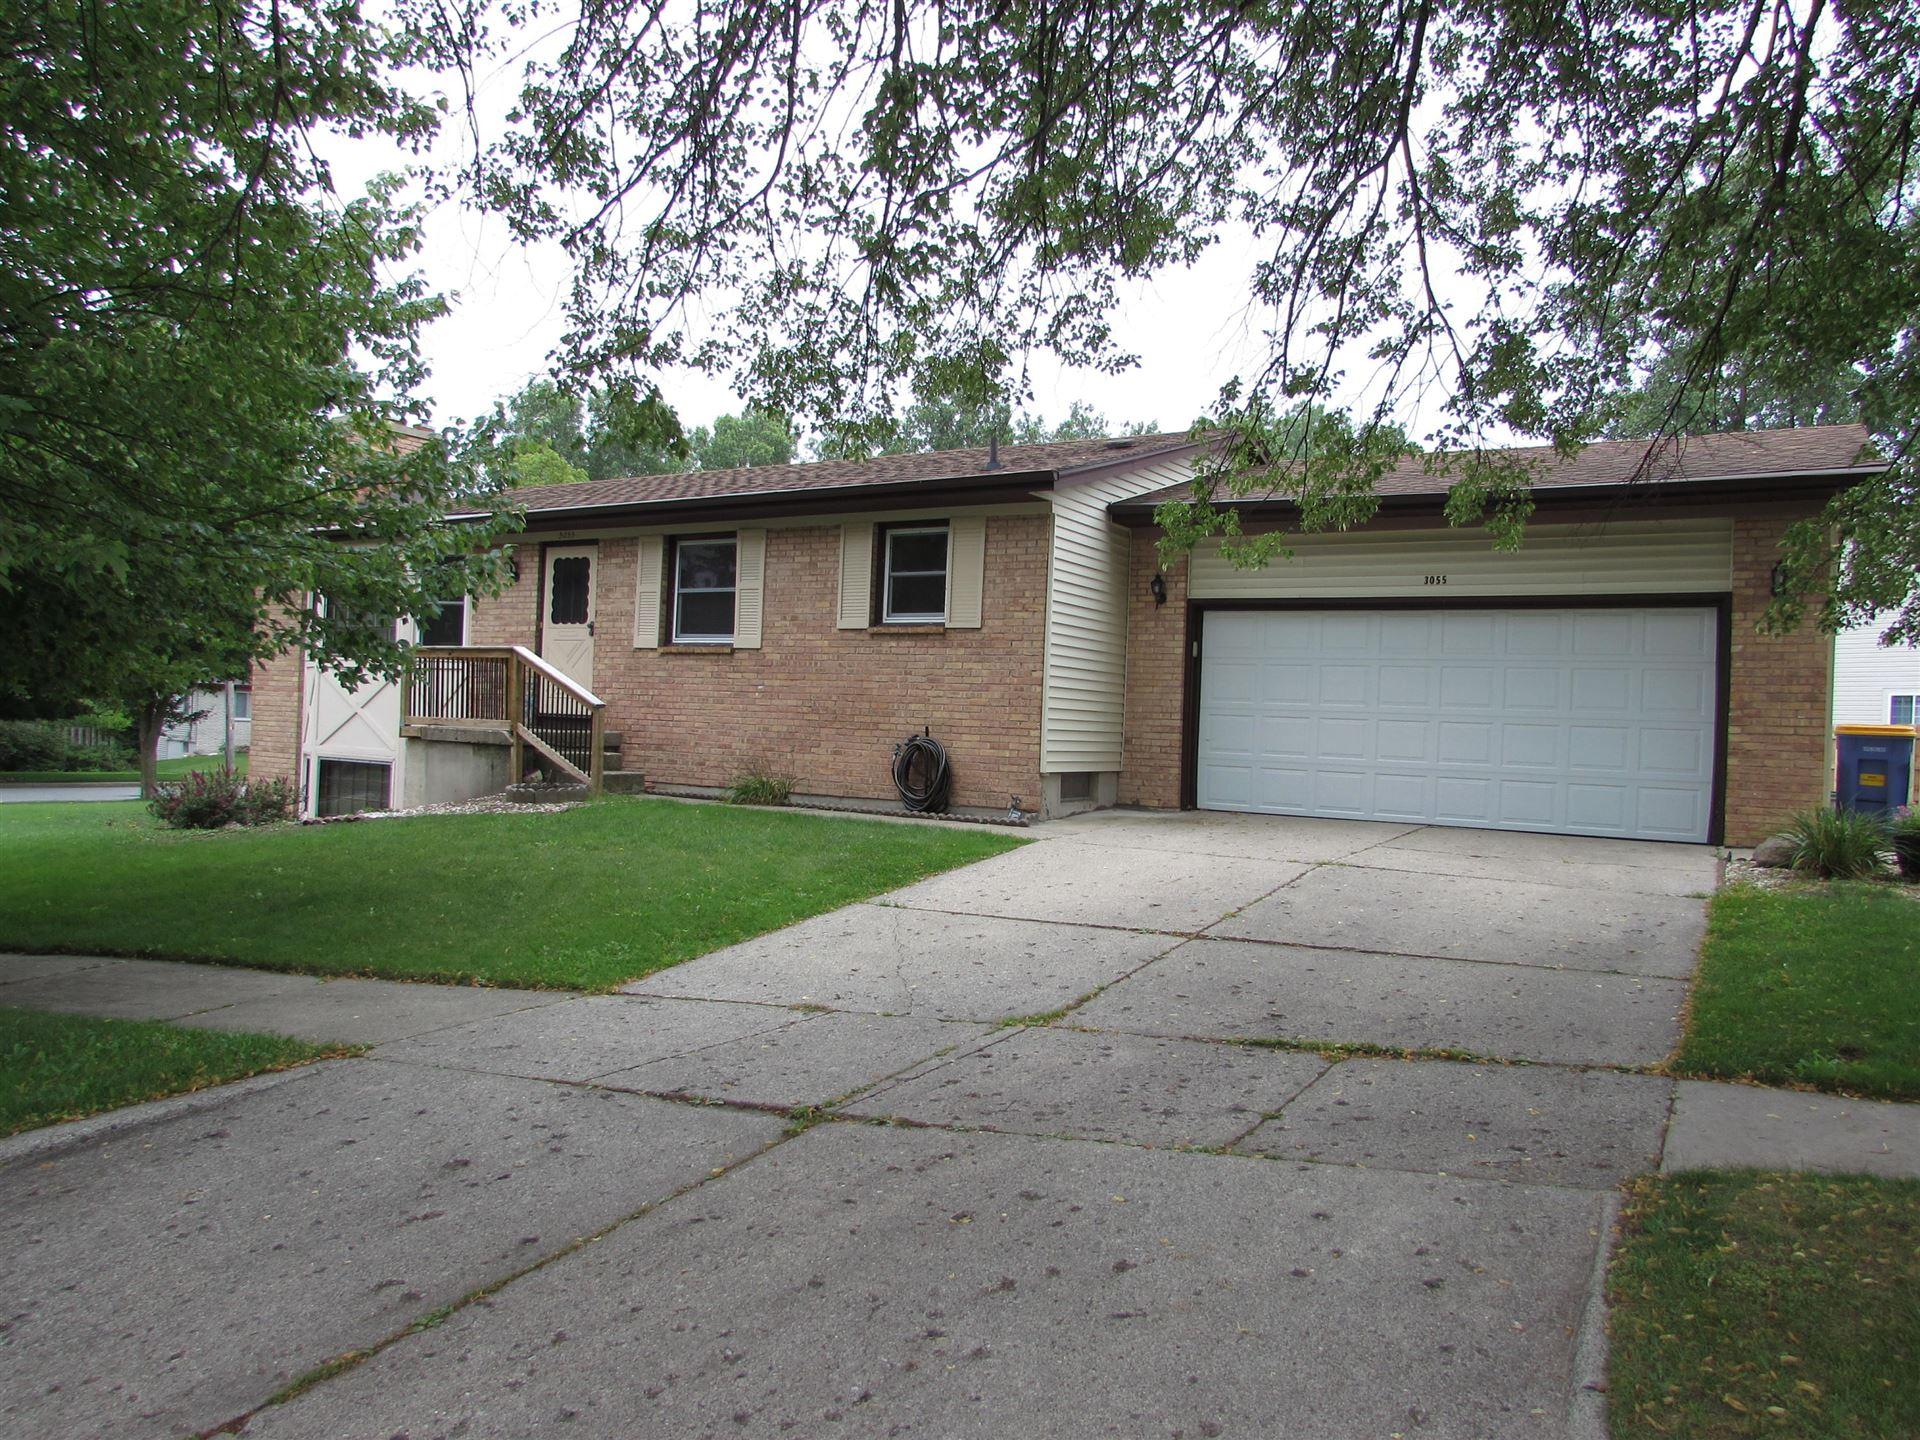 3055 Chamberlain Court SE, Grand Rapids, MI 49508 - MLS#: 21033958